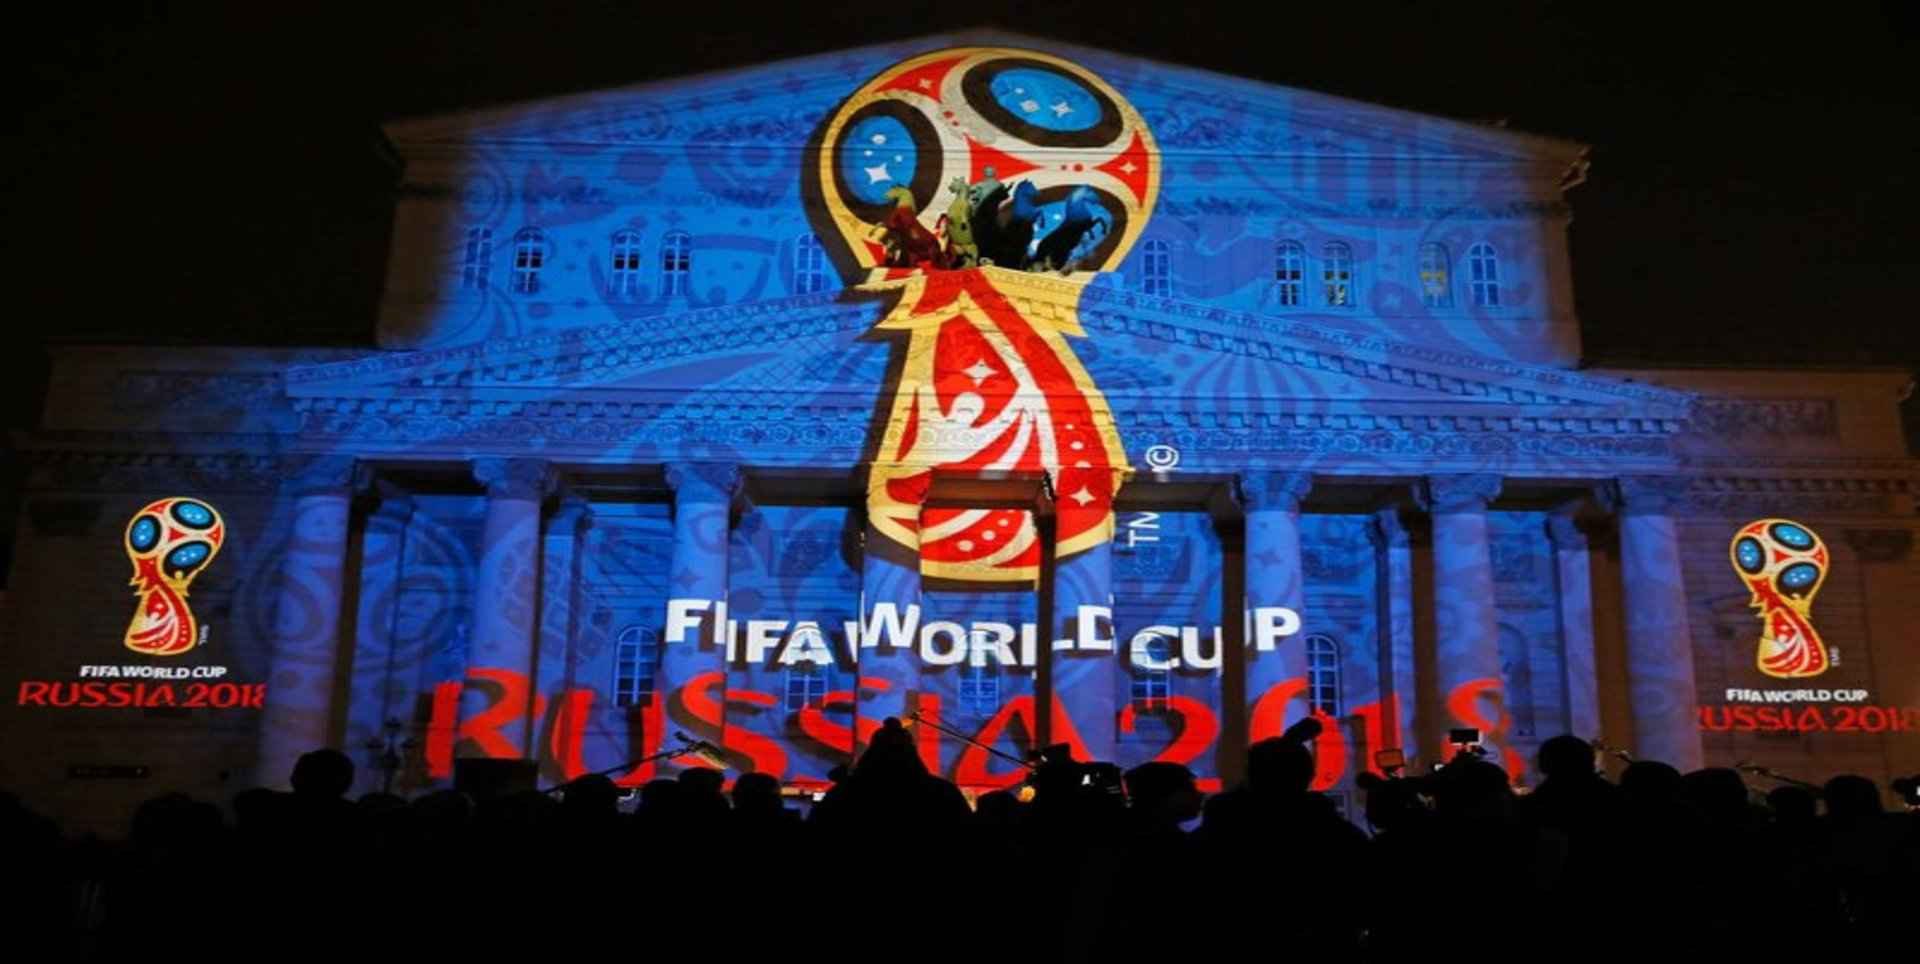 FIFA WC Luxembourg V Bulgaria Live